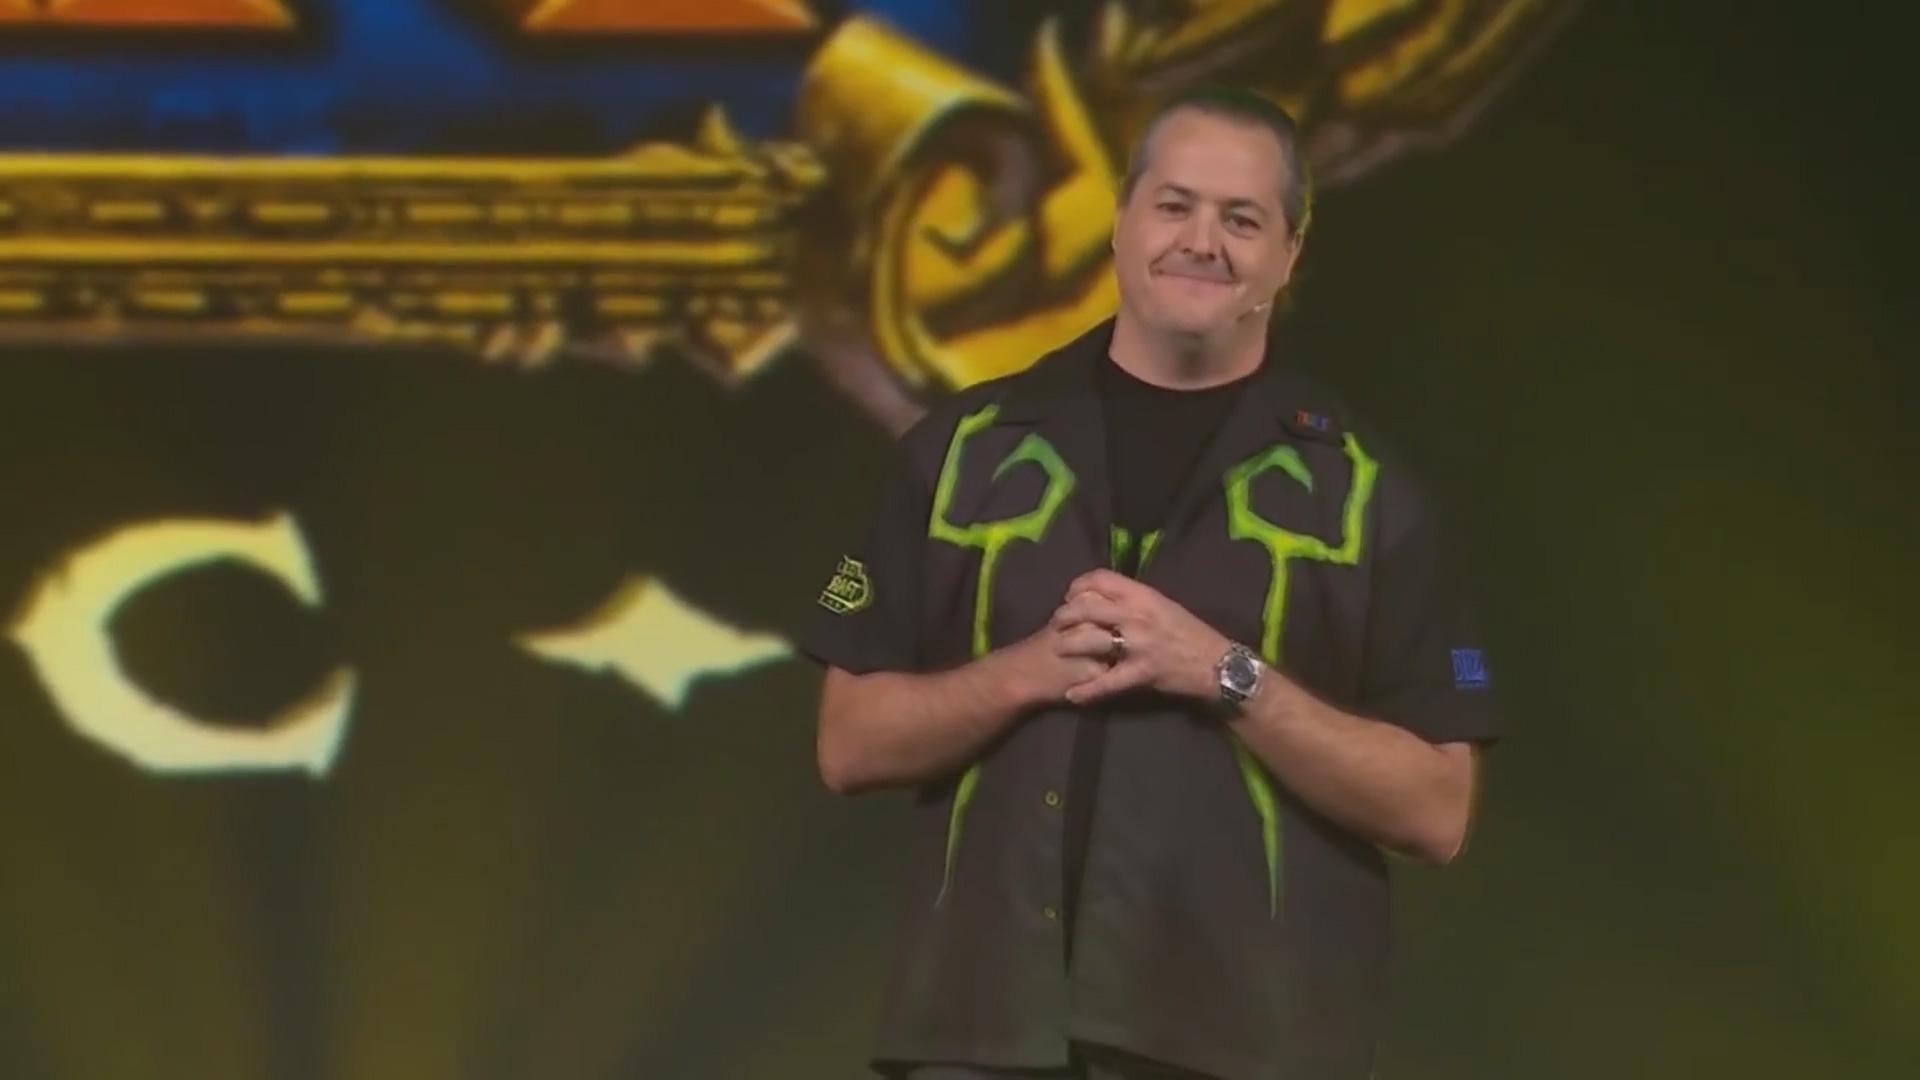 Blizzard Entertainment has named a new president screenshot